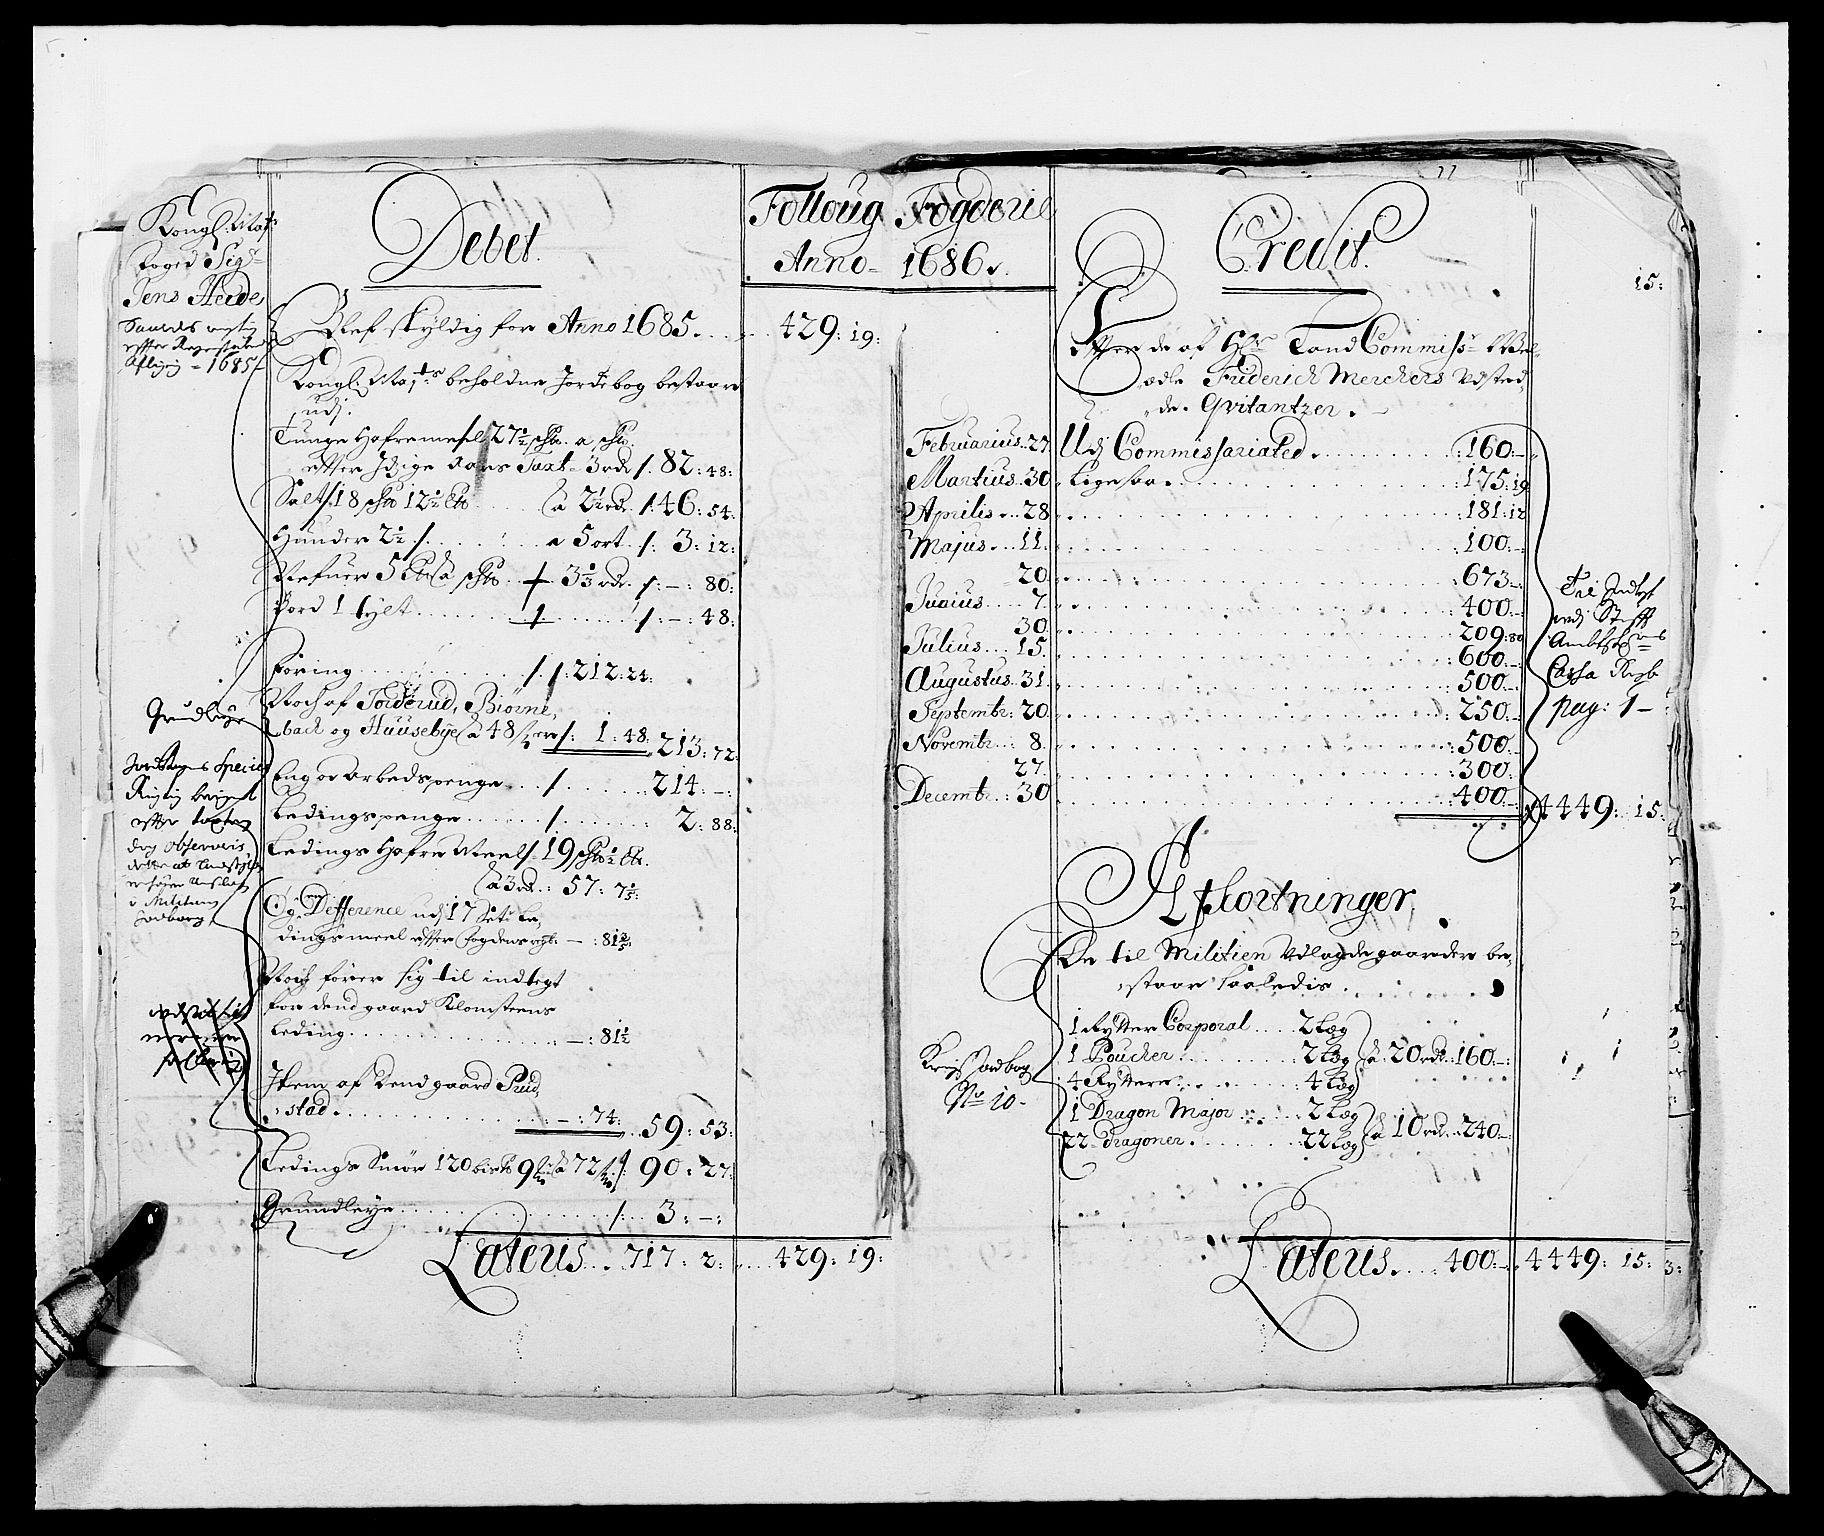 RA, Rentekammeret inntil 1814, Reviderte regnskaper, Fogderegnskap, R09/L0436: Fogderegnskap Follo, 1685-1691, s. 7